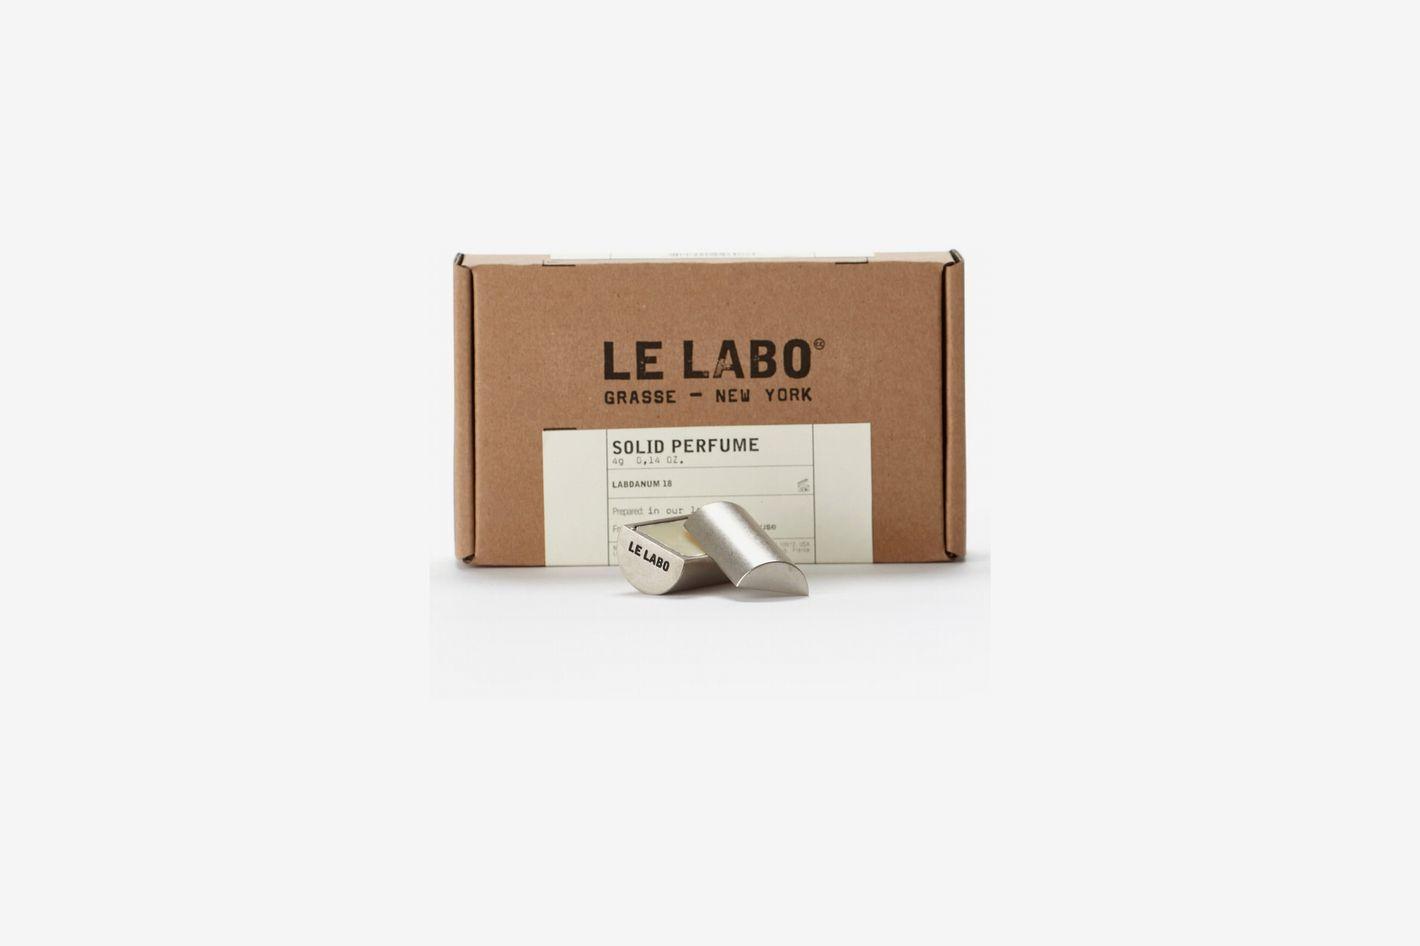 Le Labo Labdanum 18 Solid Perfume